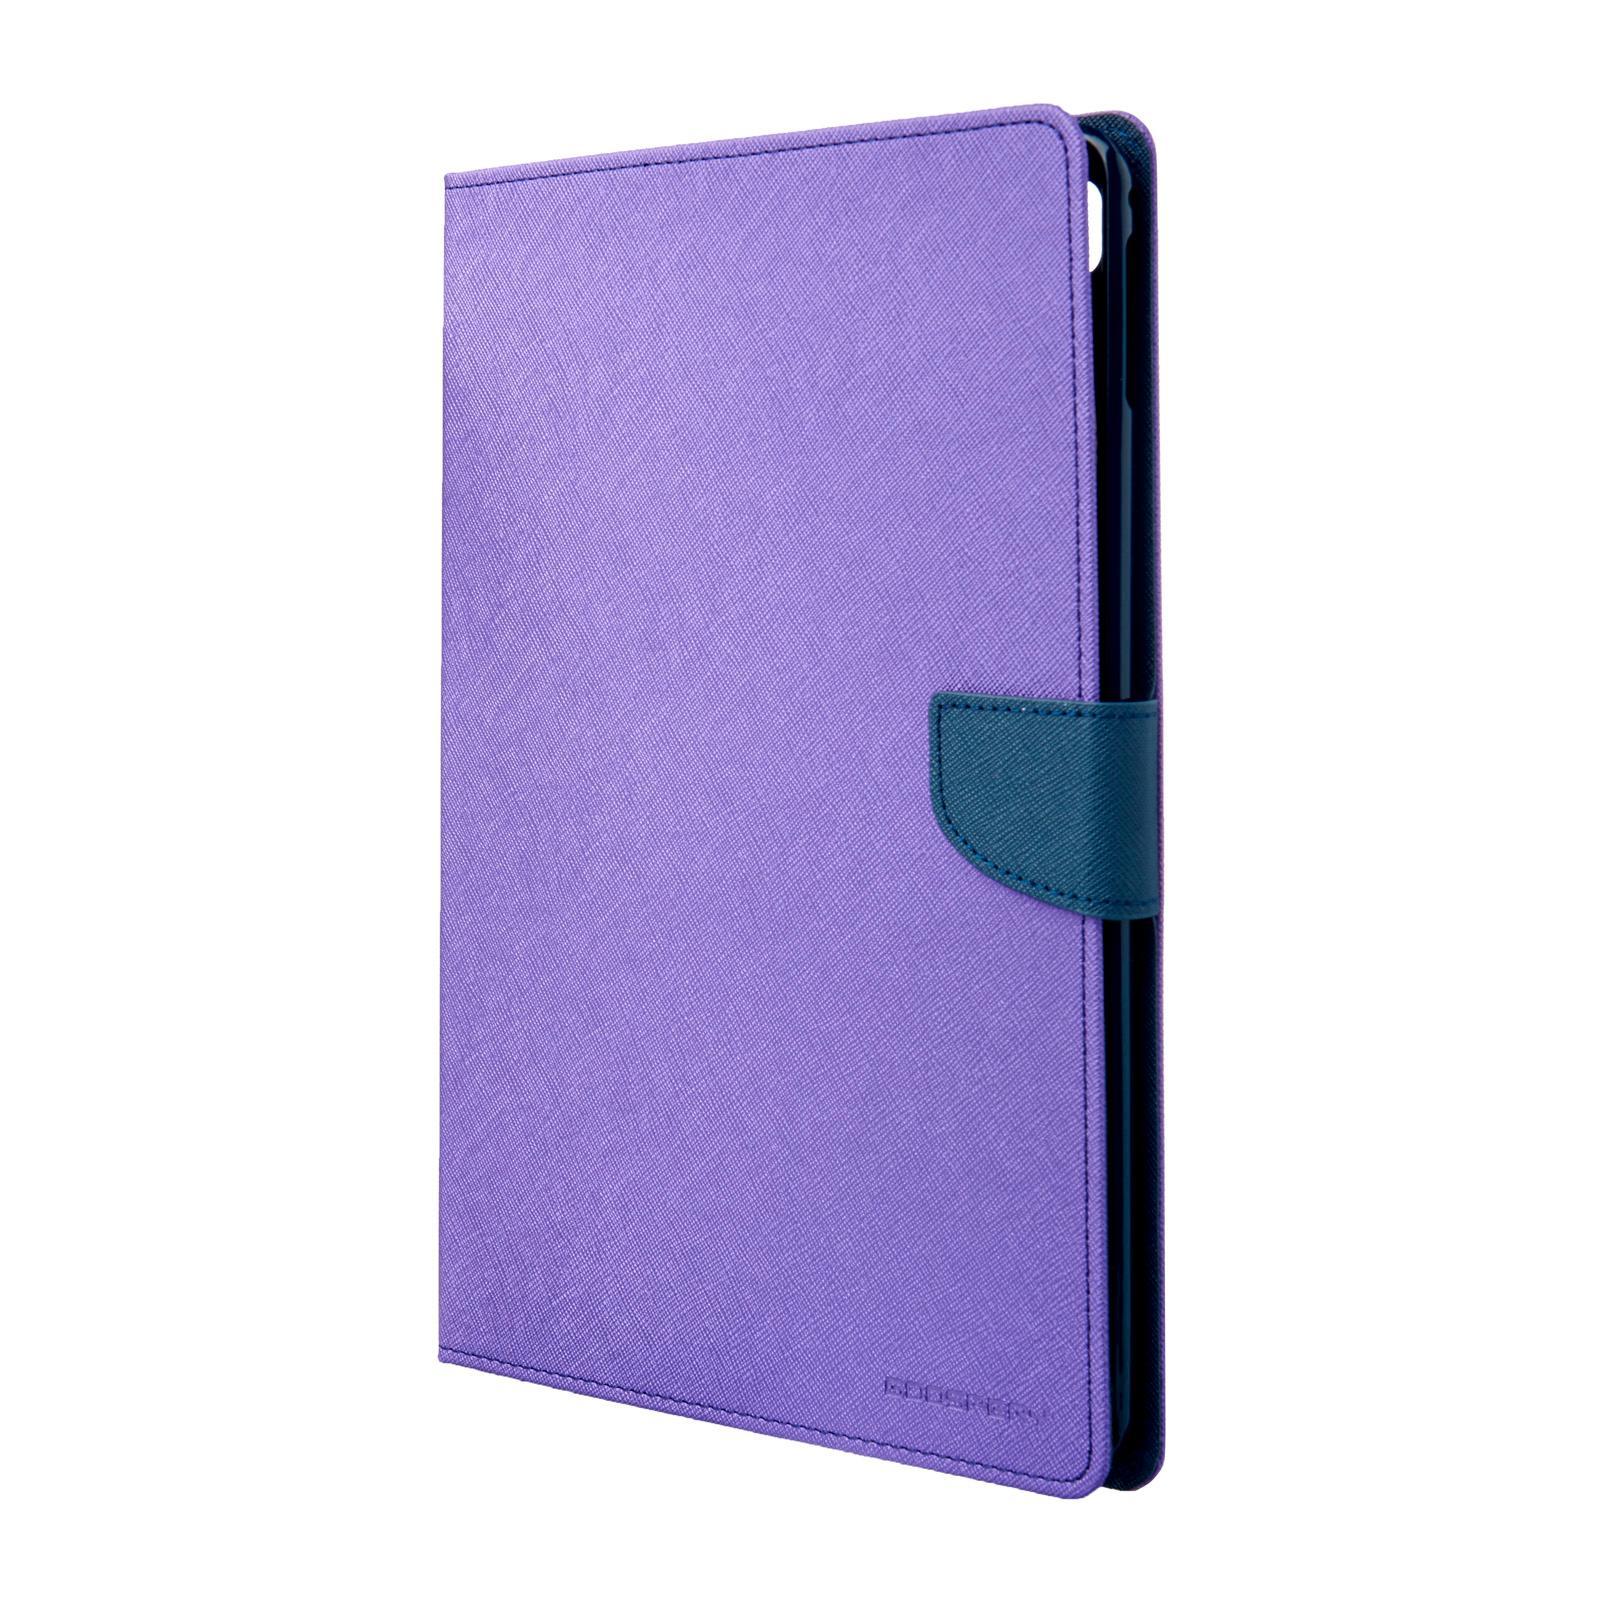 Pouzdro / kryt pro iPad Pro 9.7 - Mercury, Fancy Diary Purple/Navy